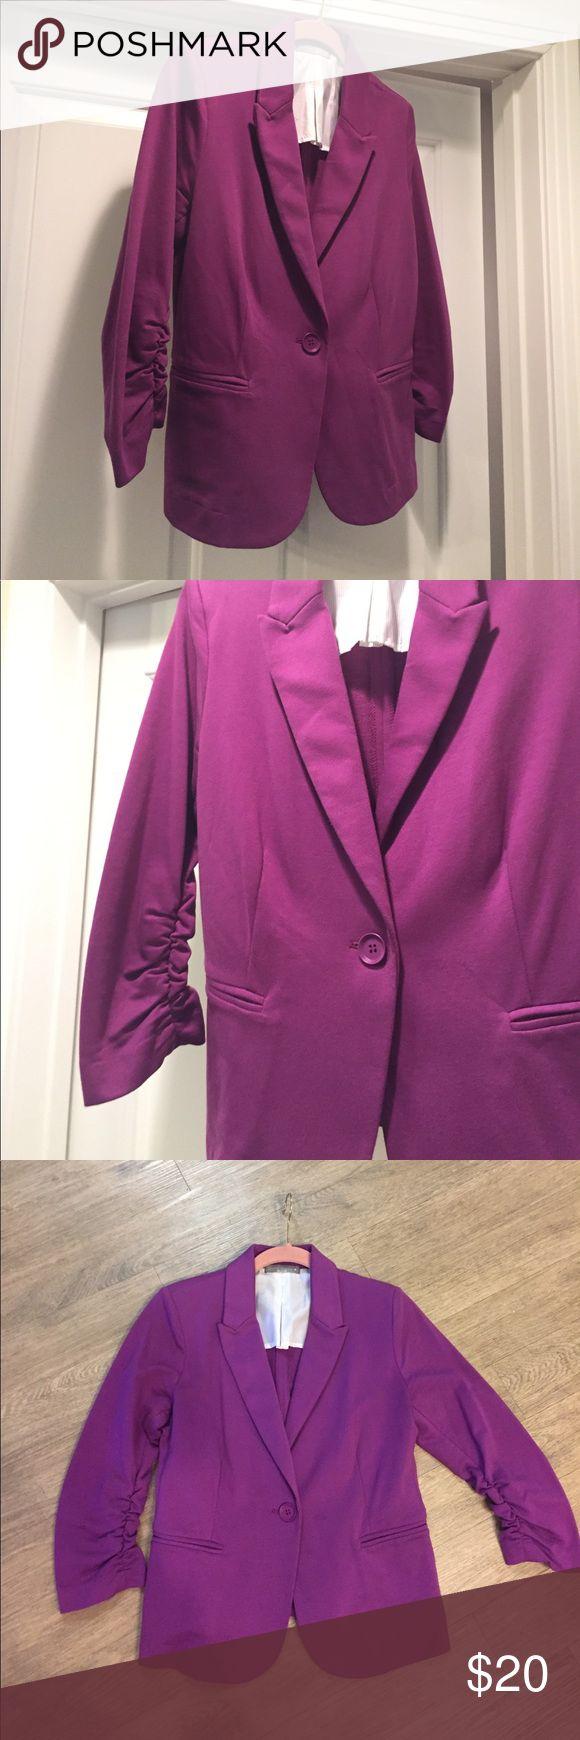 "Olivia Moon Purple Blazer (M) Olivia Moon Purple Blazer (M). Excellent Condition 15"" across (underarm).  13"" length (underarm to hem) Olivia Moon Jackets & Coats Blazers"